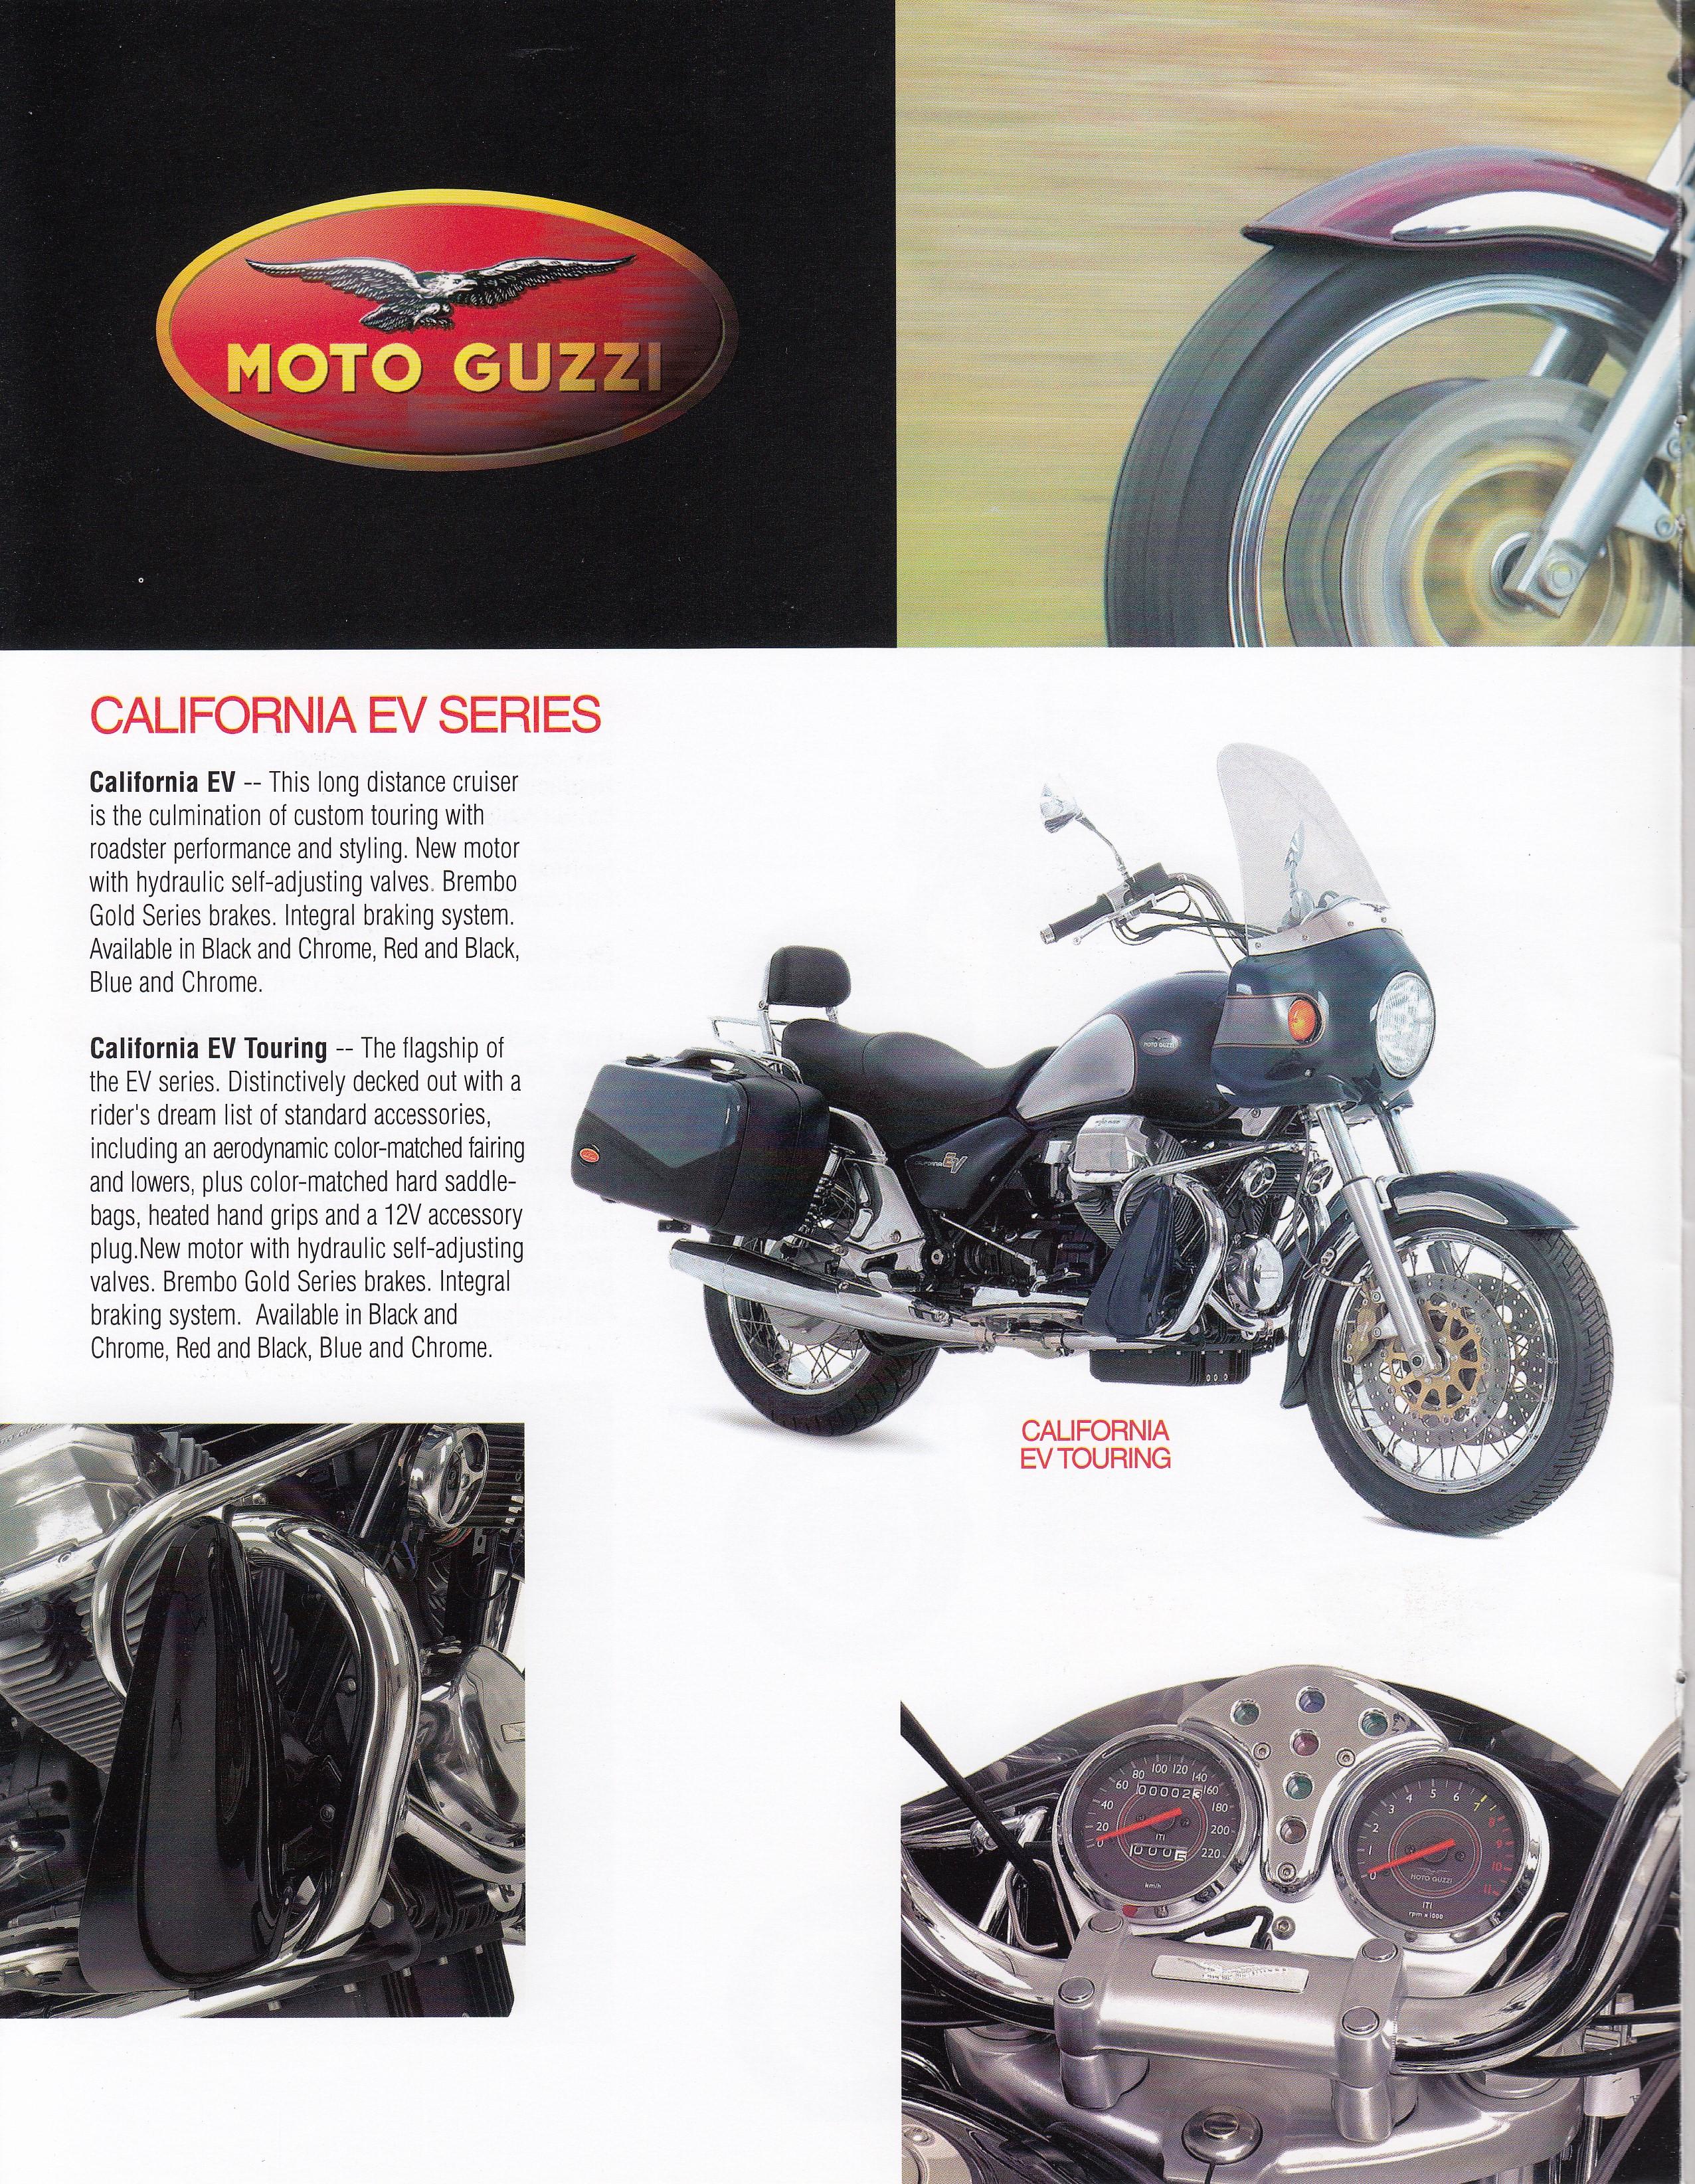 brochure - moto guzzi 2003 - more moto guzzi topics - moto guzzi - topics